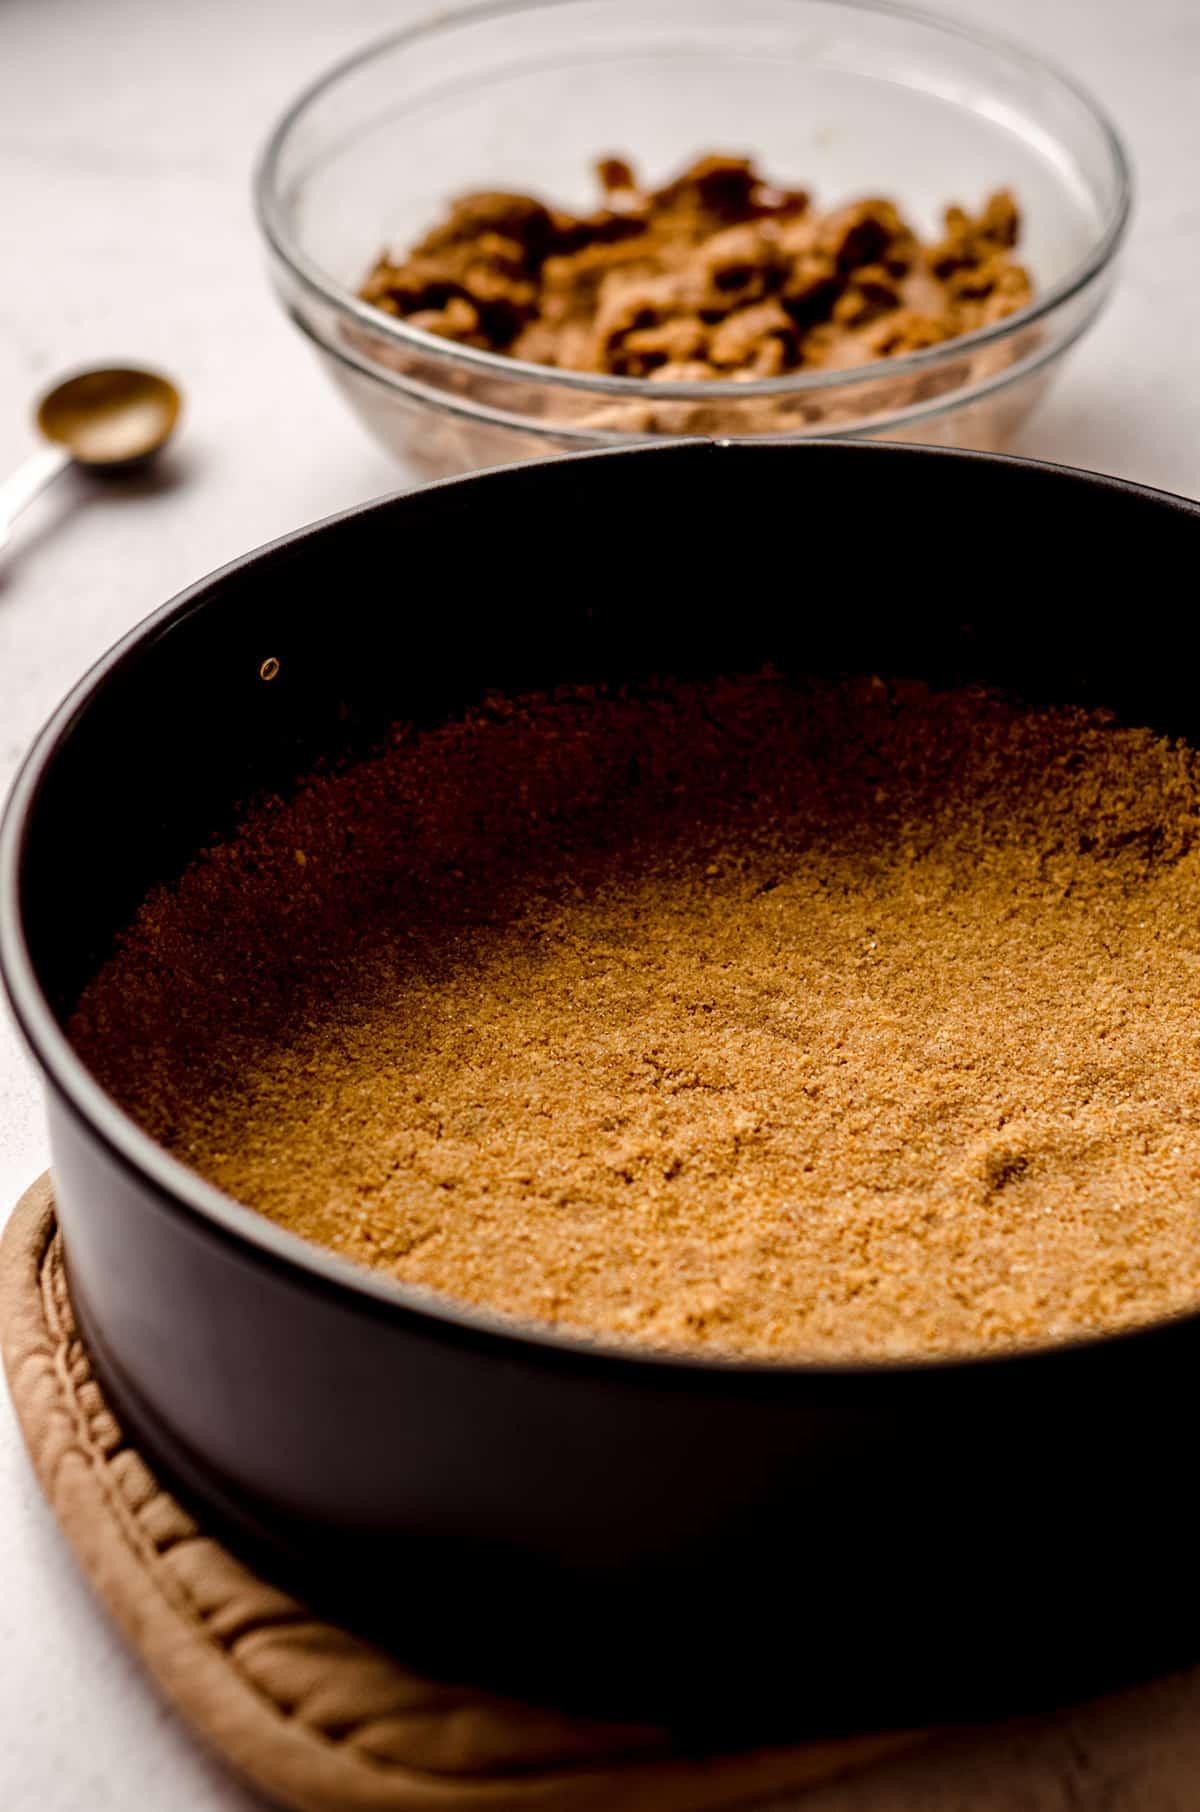 nilla wafer crust in a springform pan